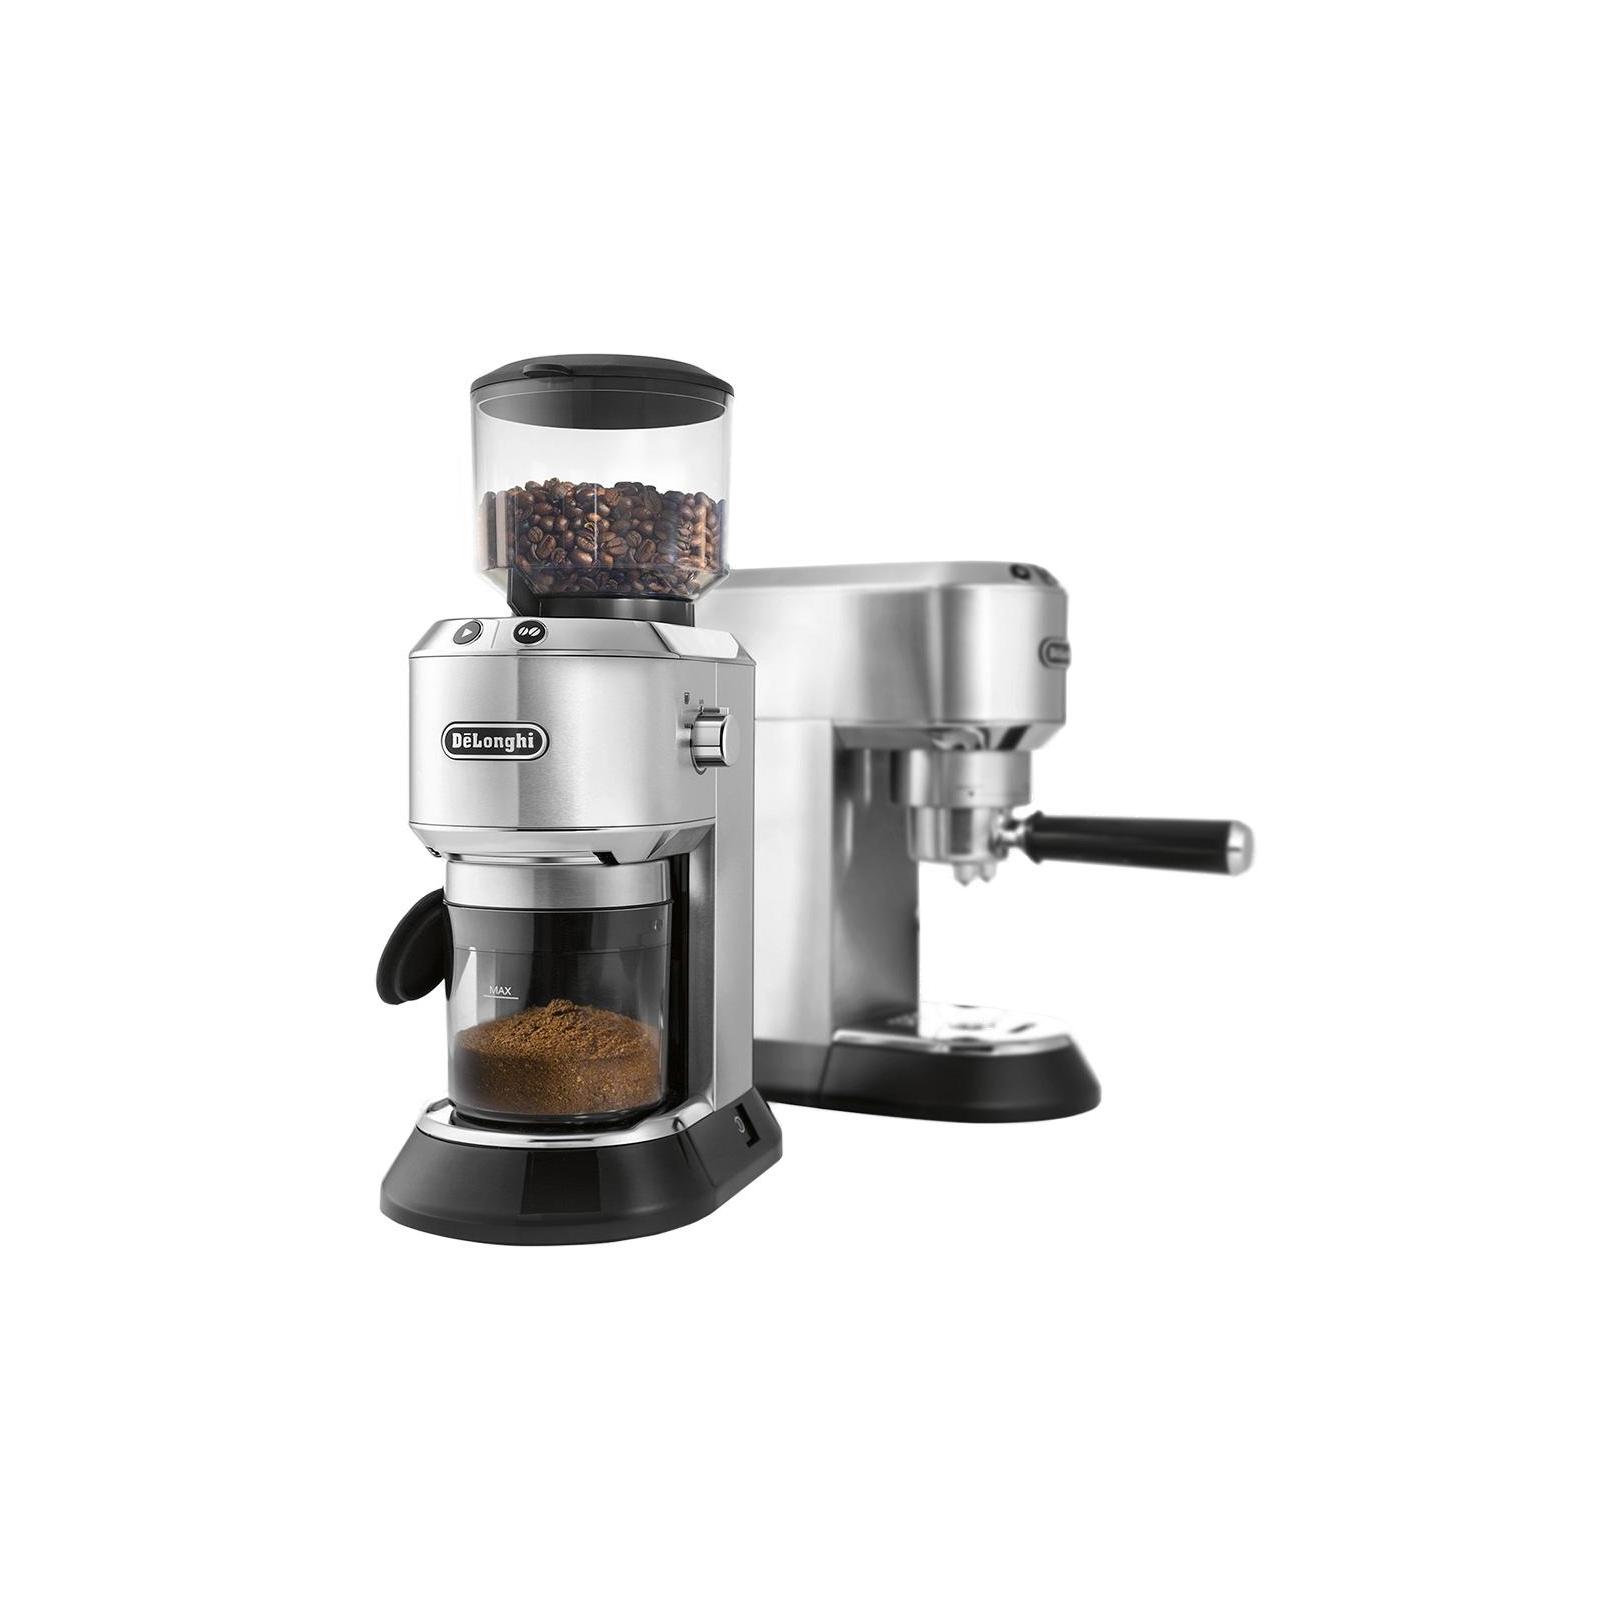 Кофемолка DeLonghi KG 521 M изображение 3